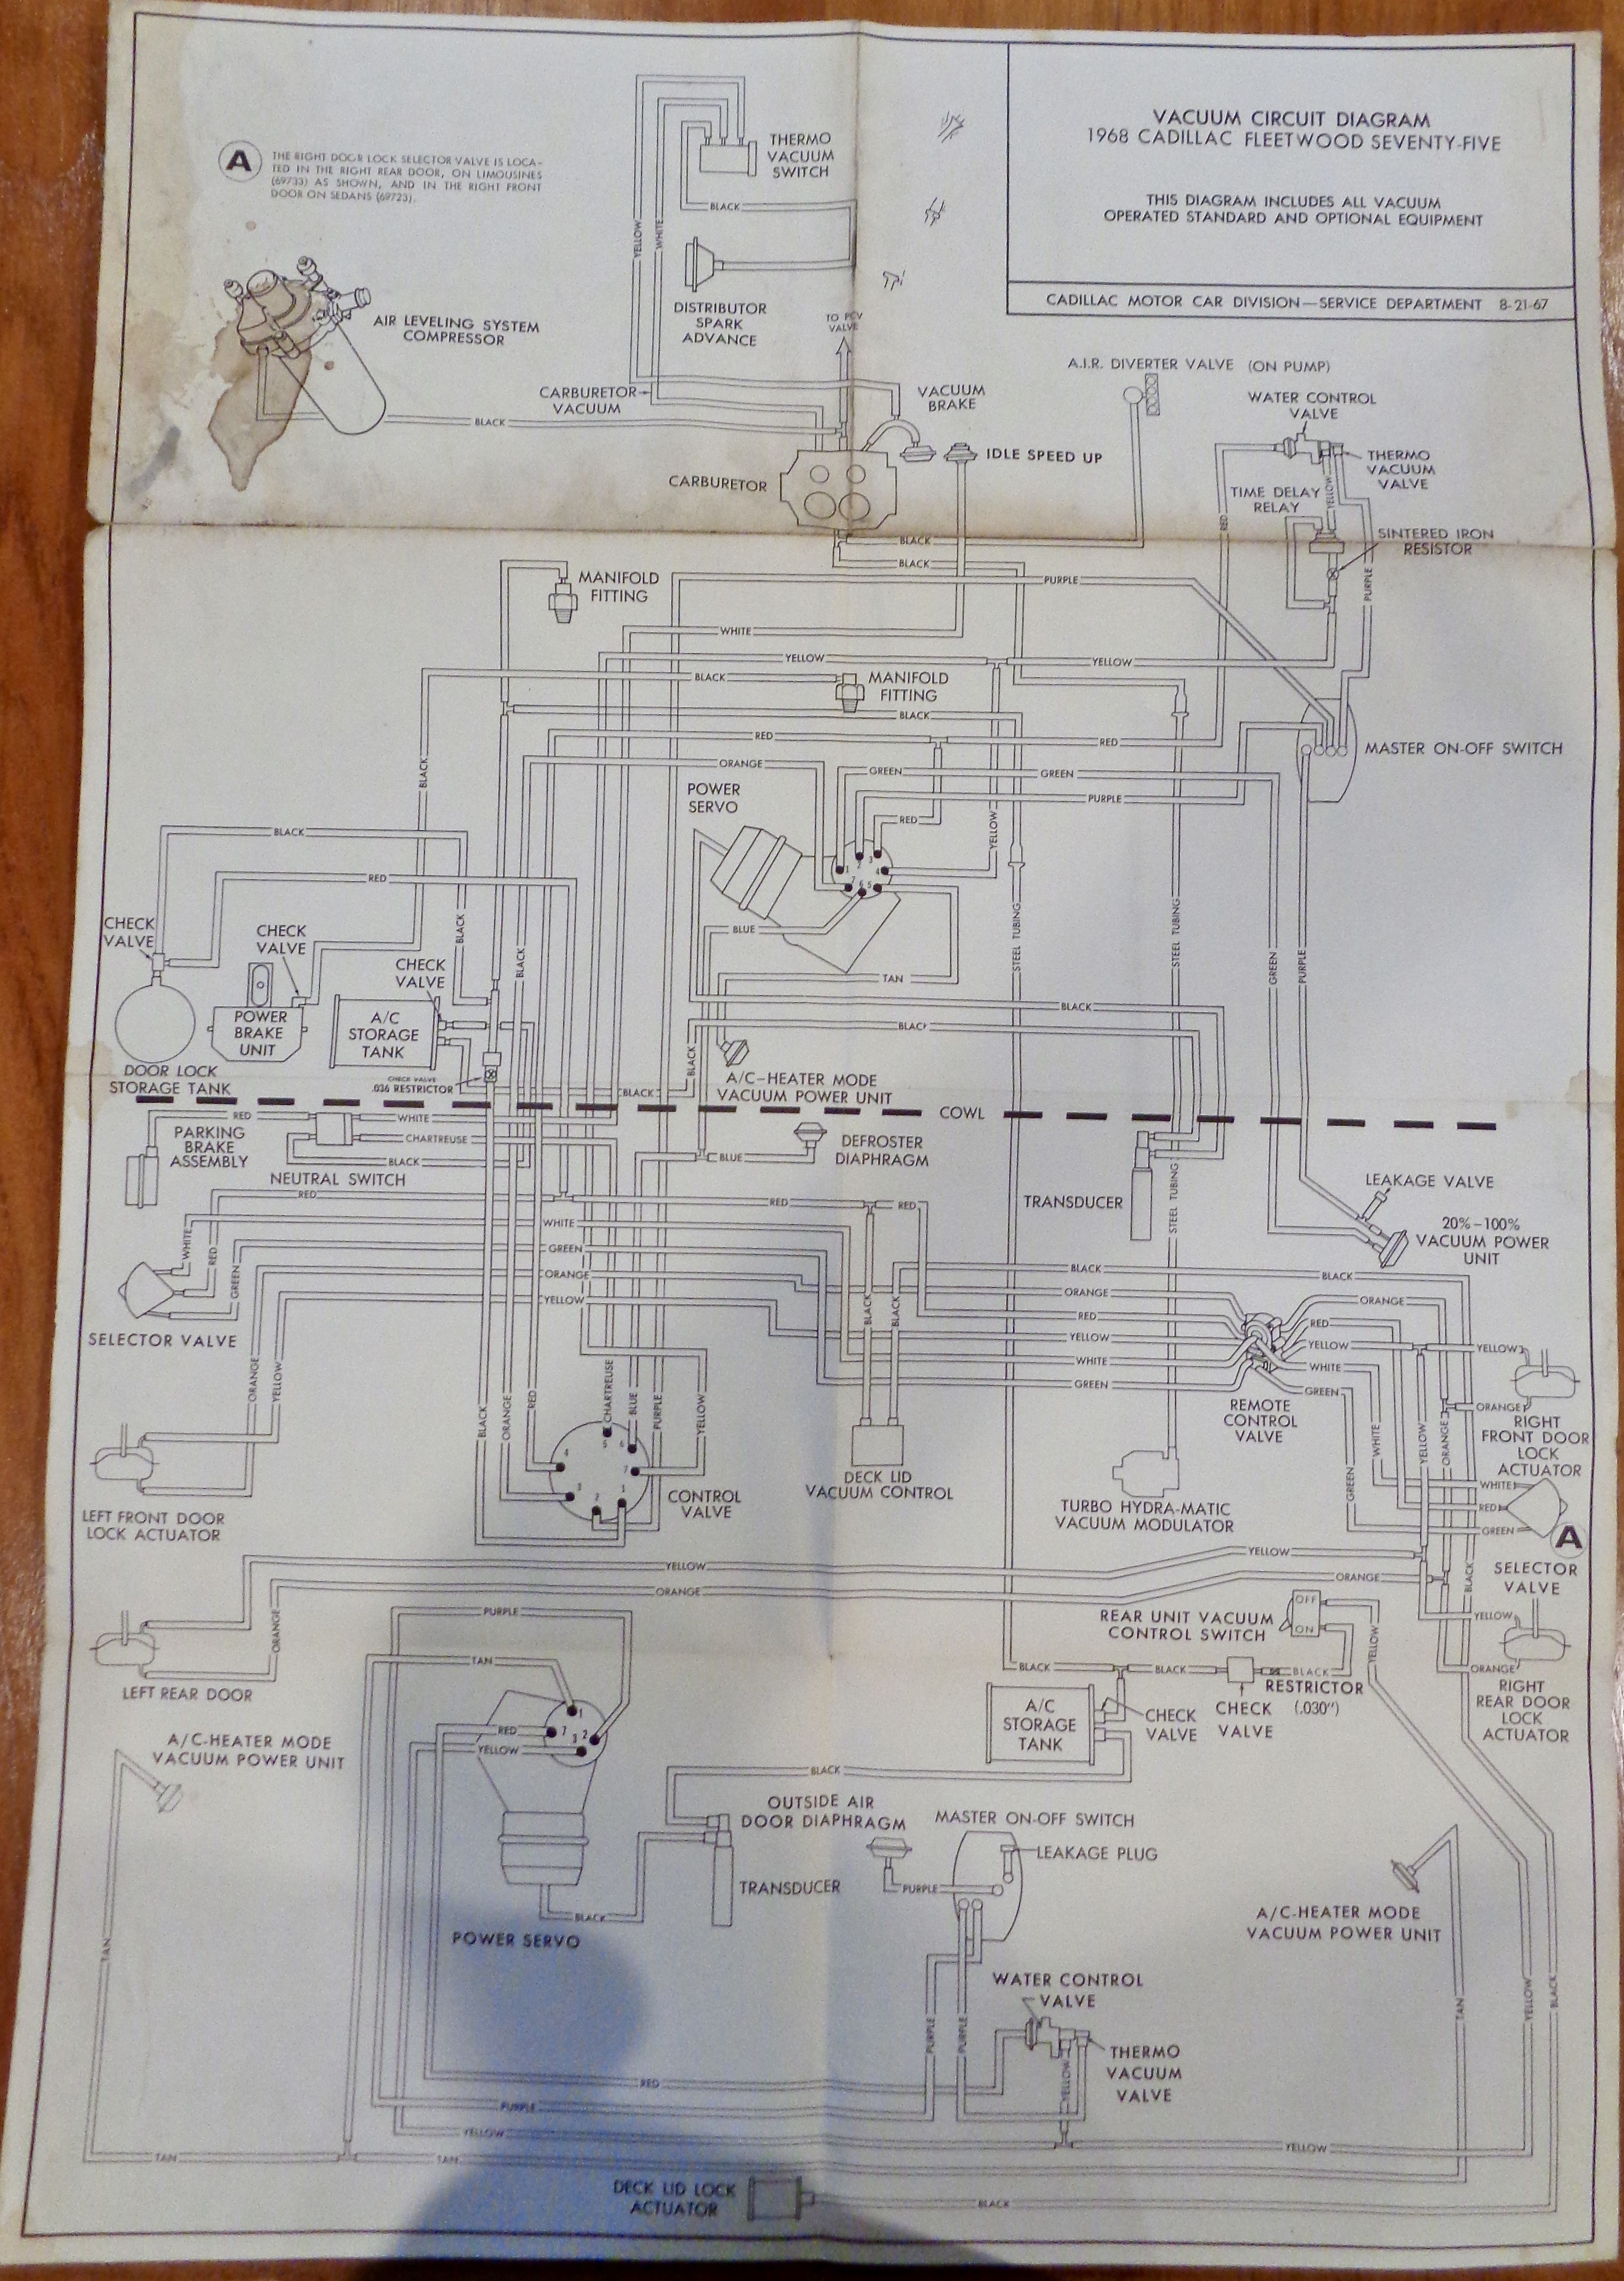 Wiring Diagram Further 1969 Cadillac Wiring Diagram On 1968 Cadillac